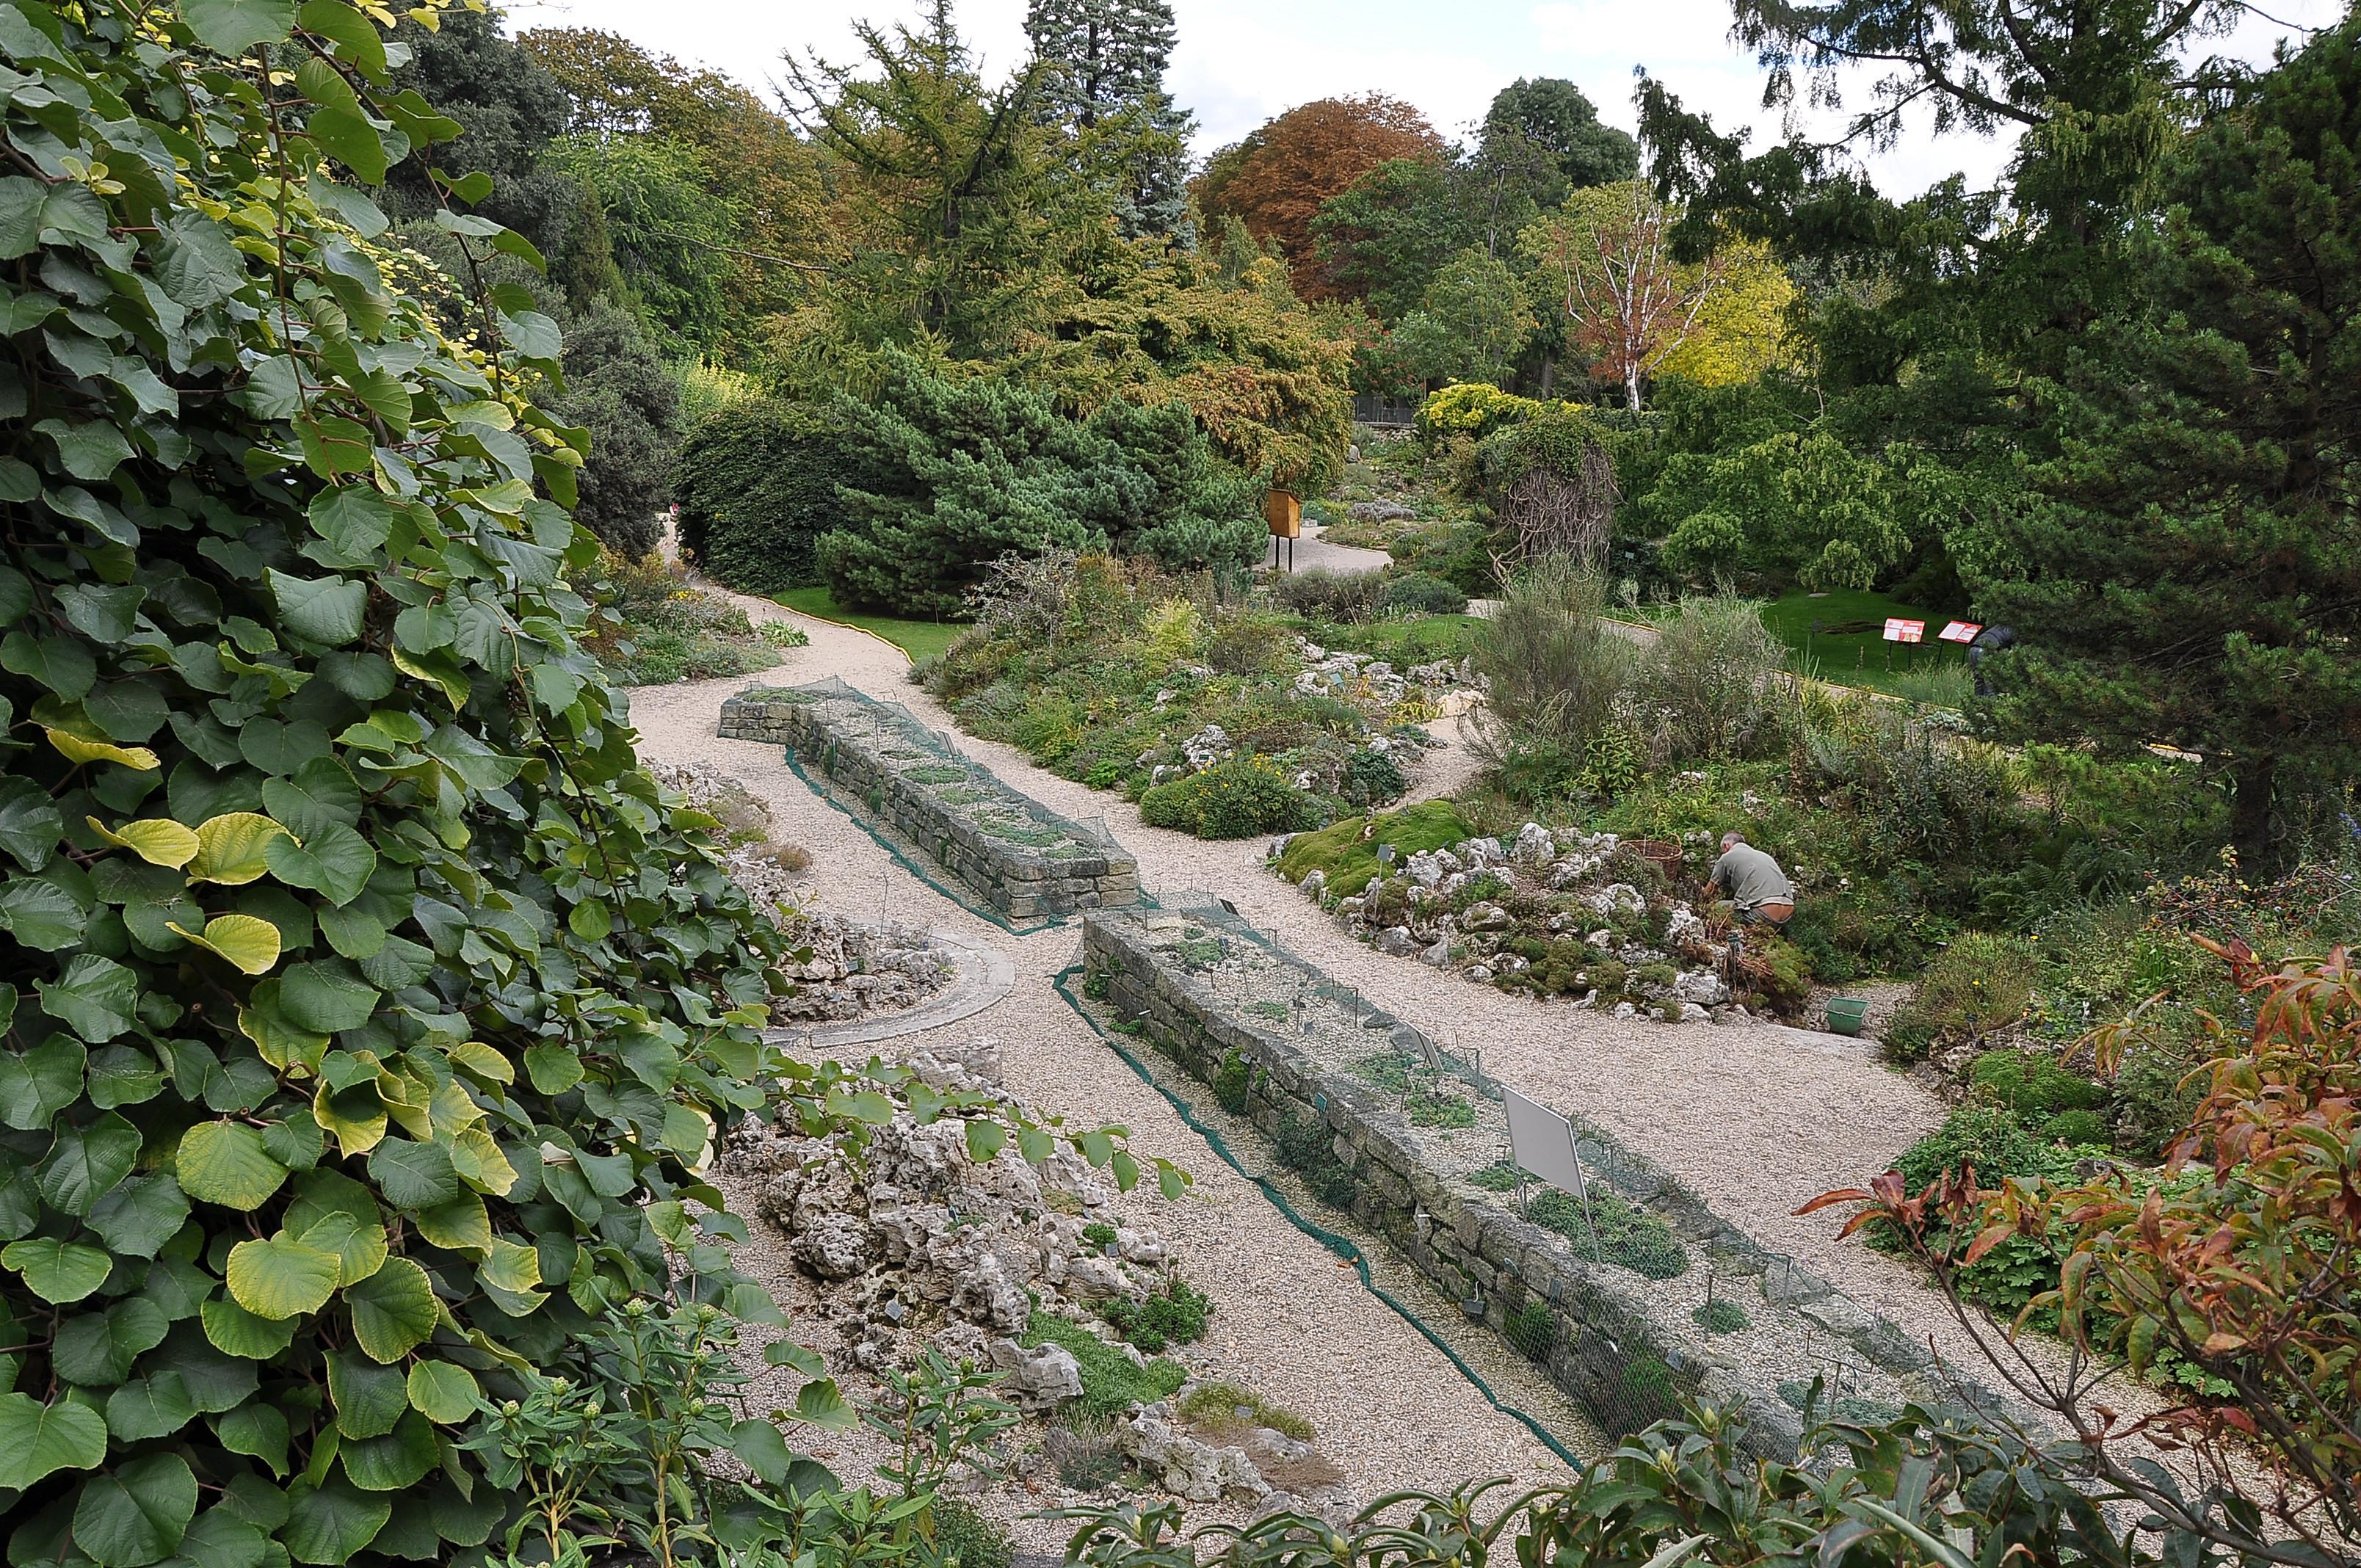 Plantes du jardin elegant plantes du jardin with plantes for Plantes du jardin